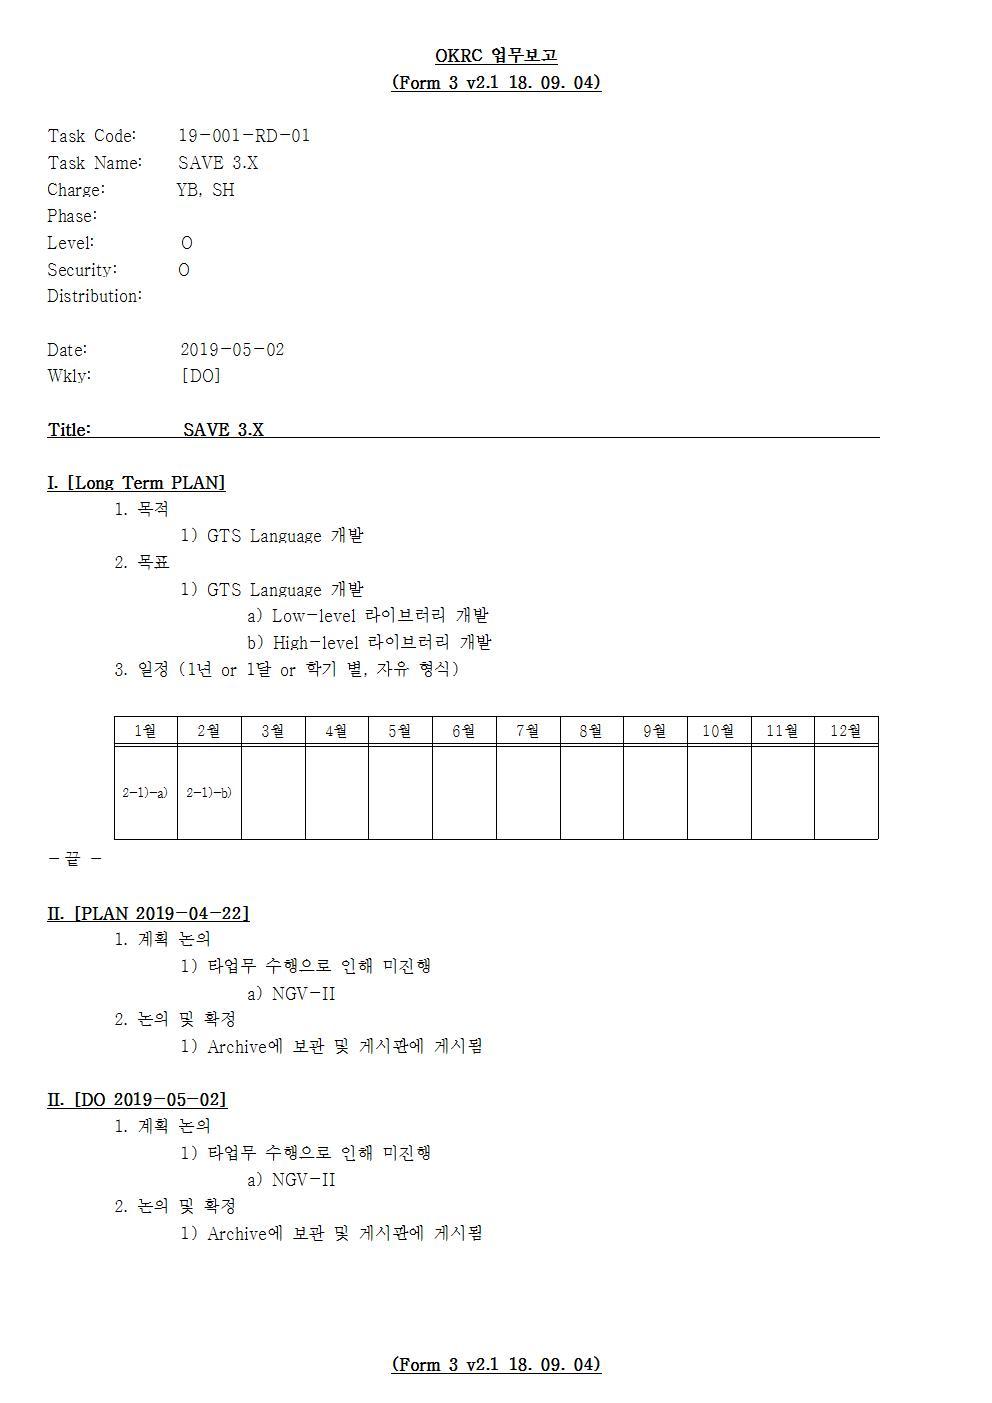 D-[19-001-RD-01]-[SAVE 3.X]-[2019-05-02][SH]001.jpg